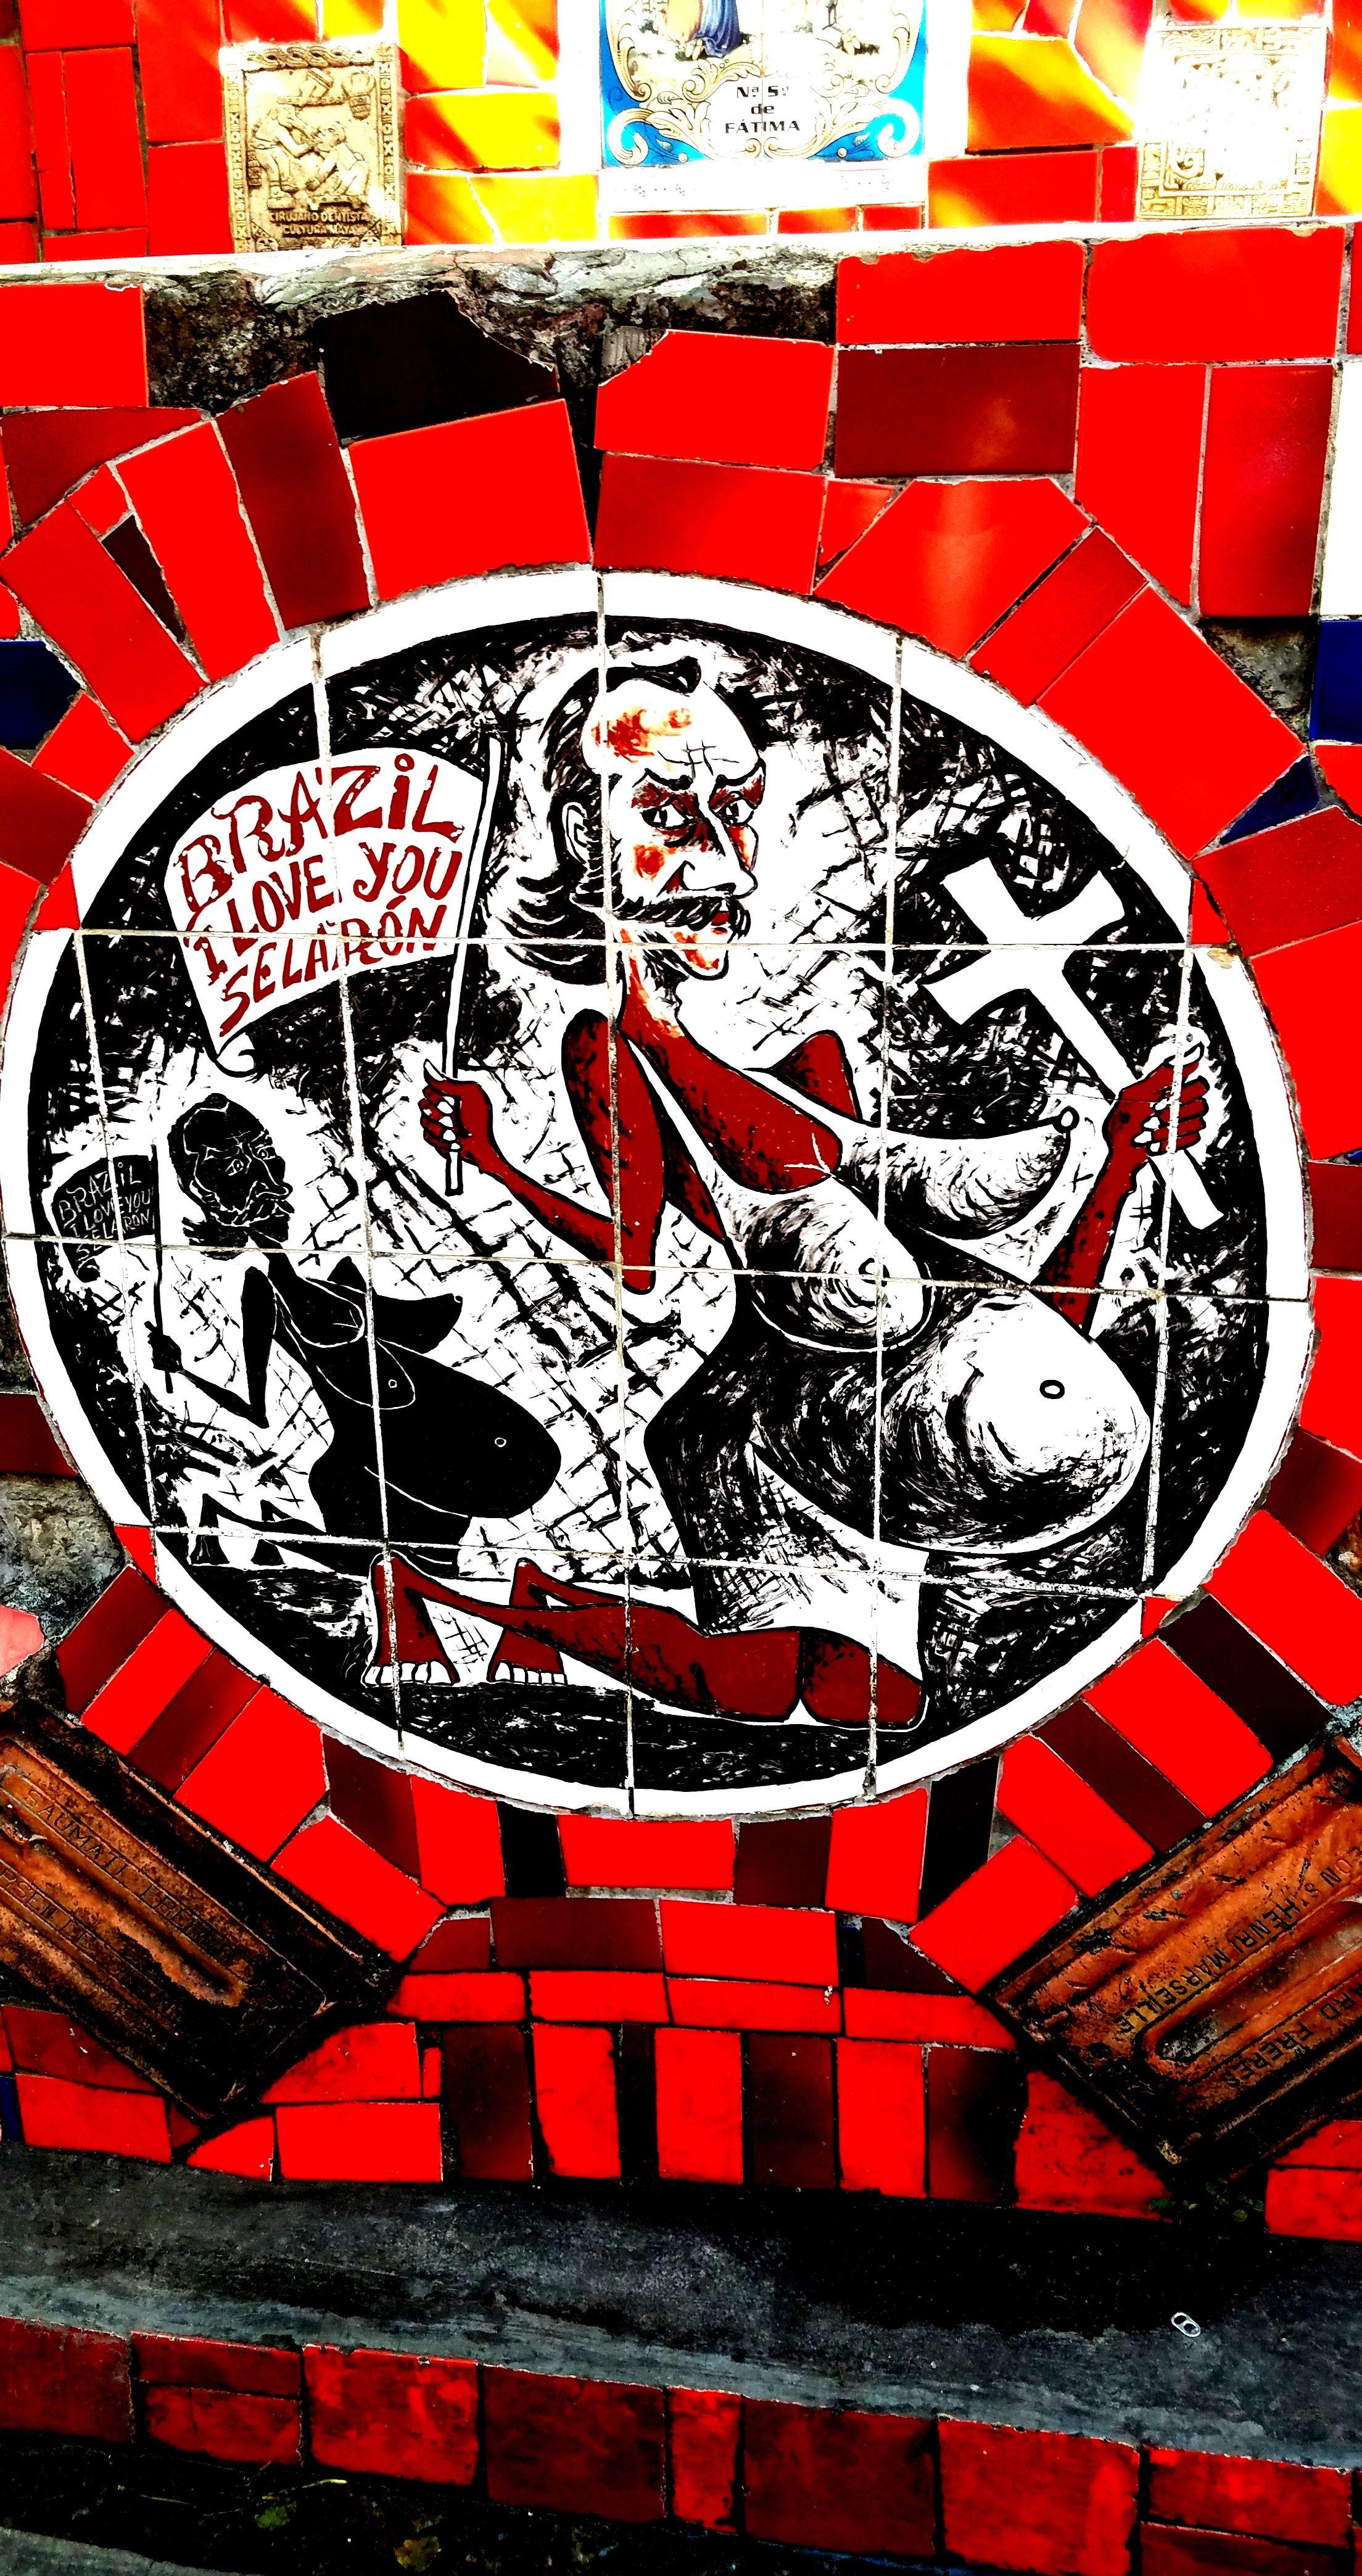 Color art and empire by natasha eaton - Rio De Janeiro Brasil Mosaic Ceramic Tile Art From The Lapa Neighborhood Centro